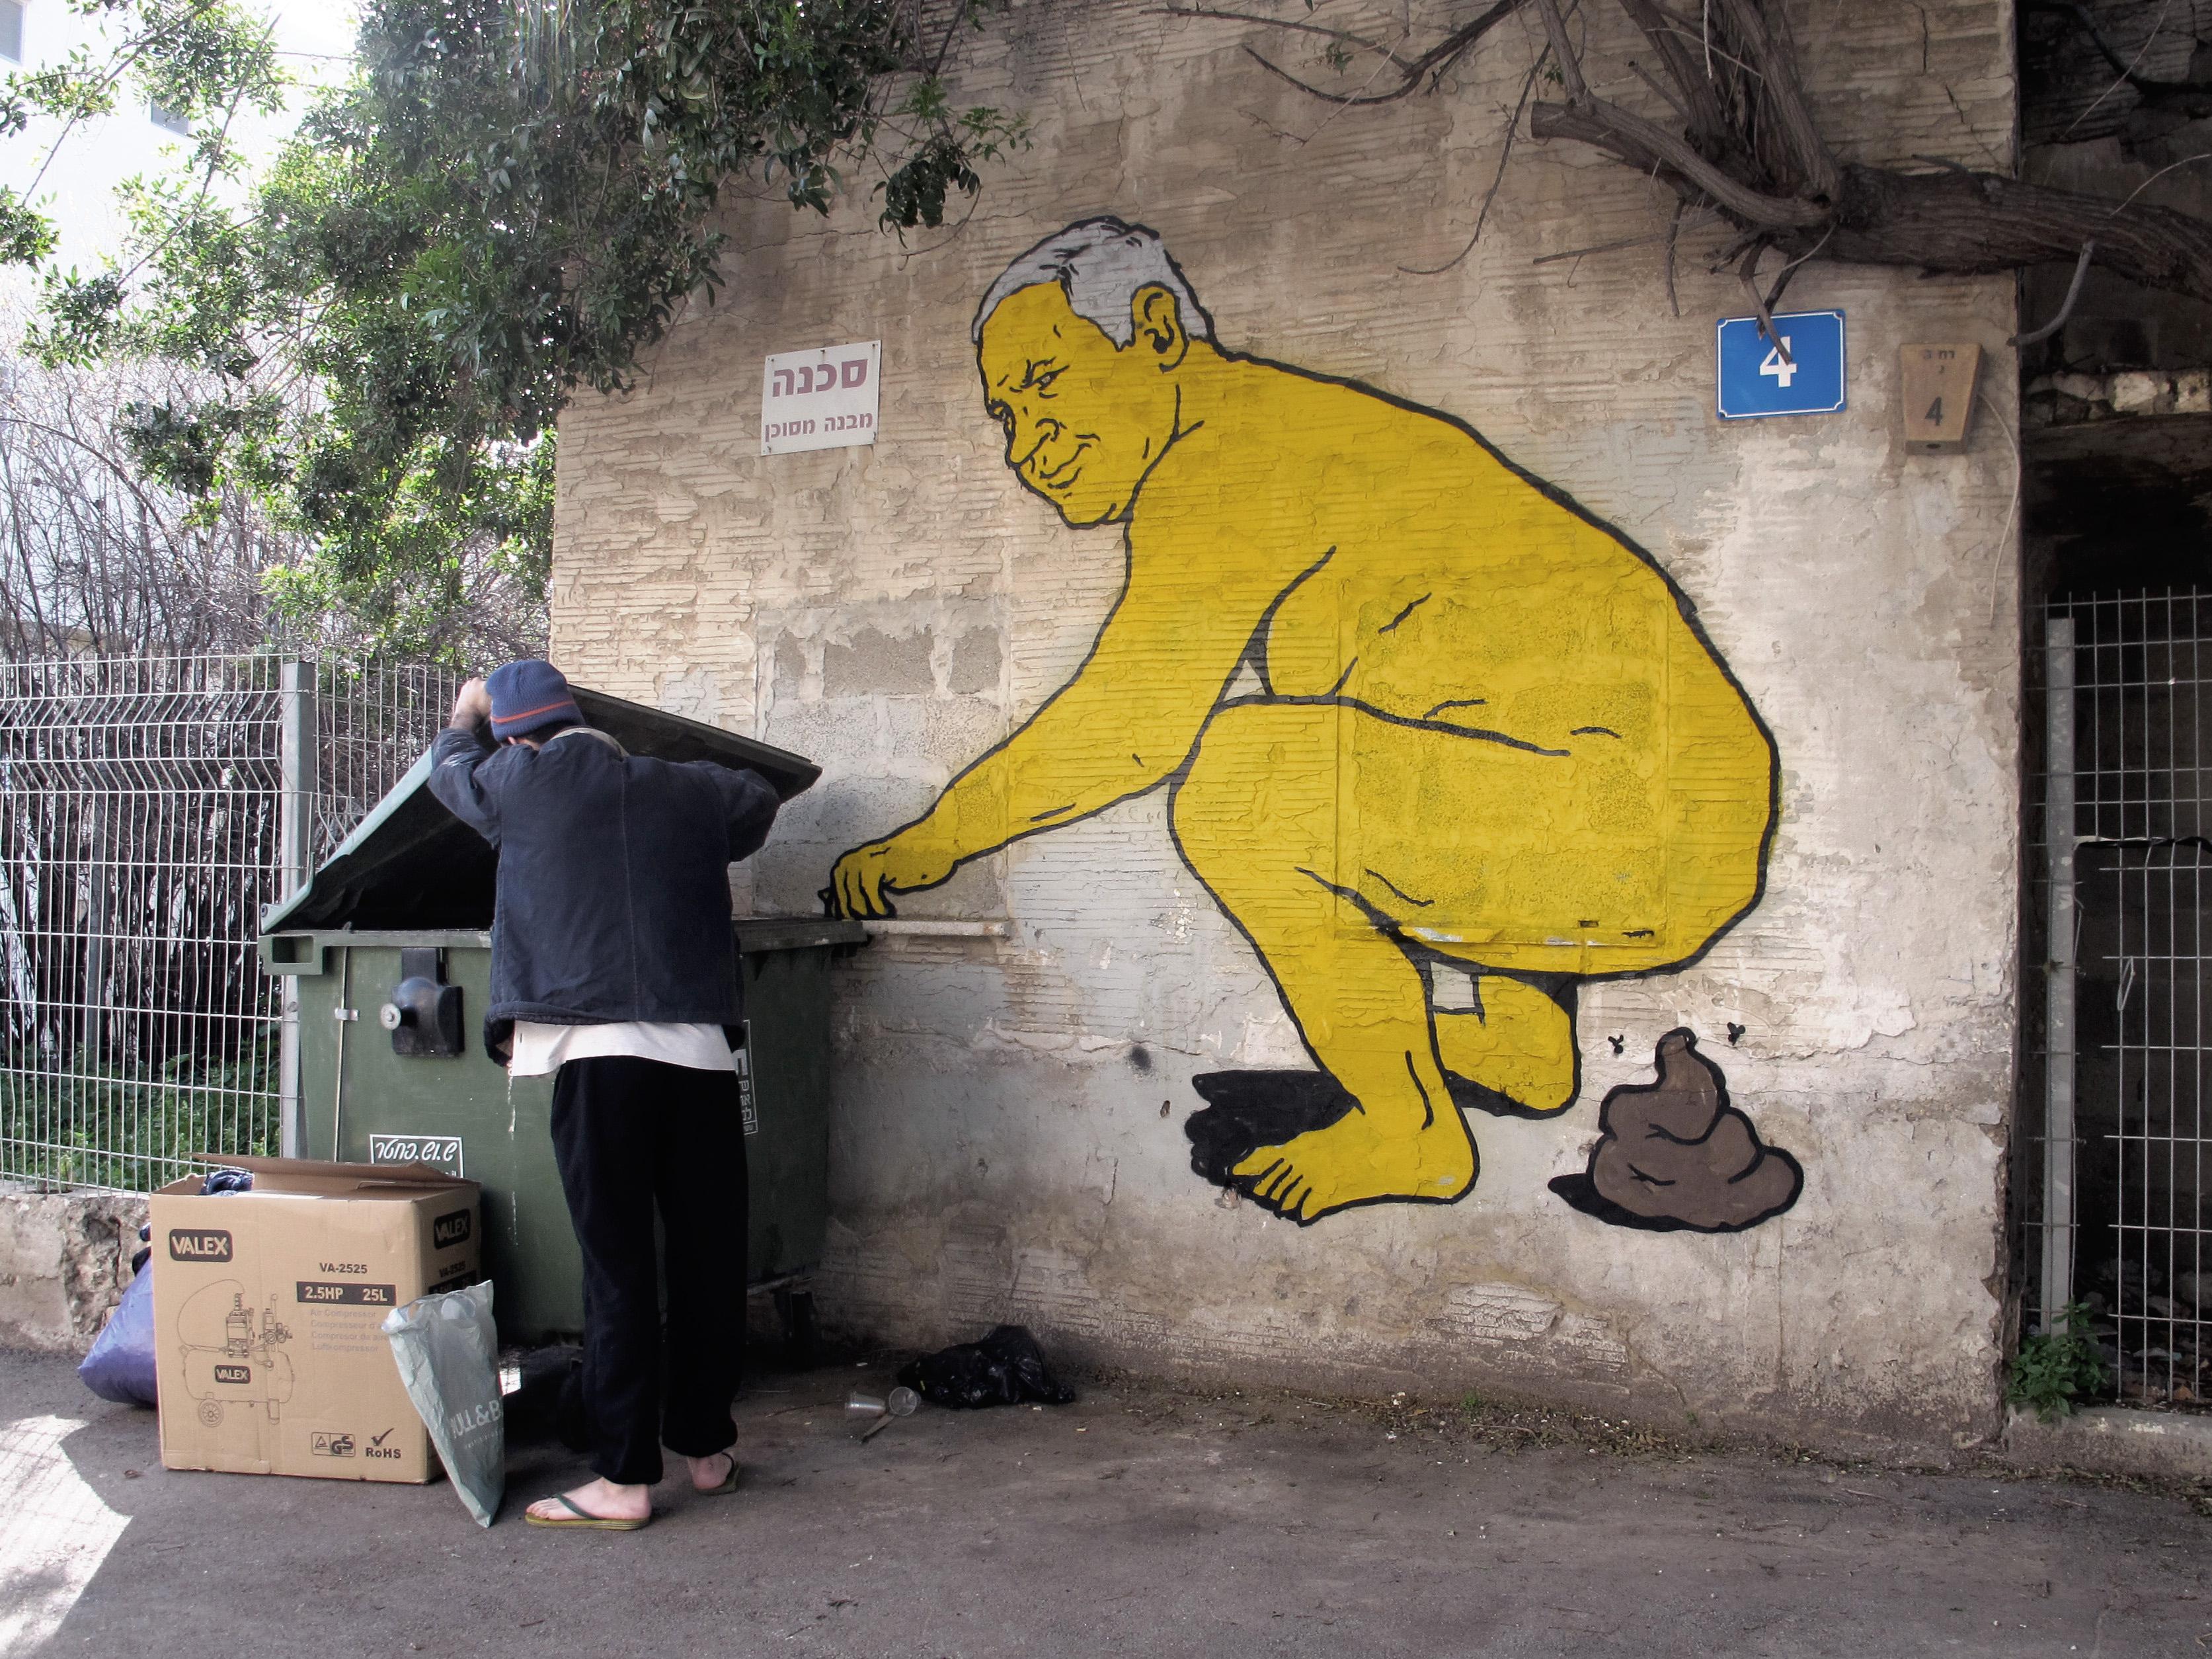 bibi shitter unga broken fingaz israel political street art shit graffiti haifa